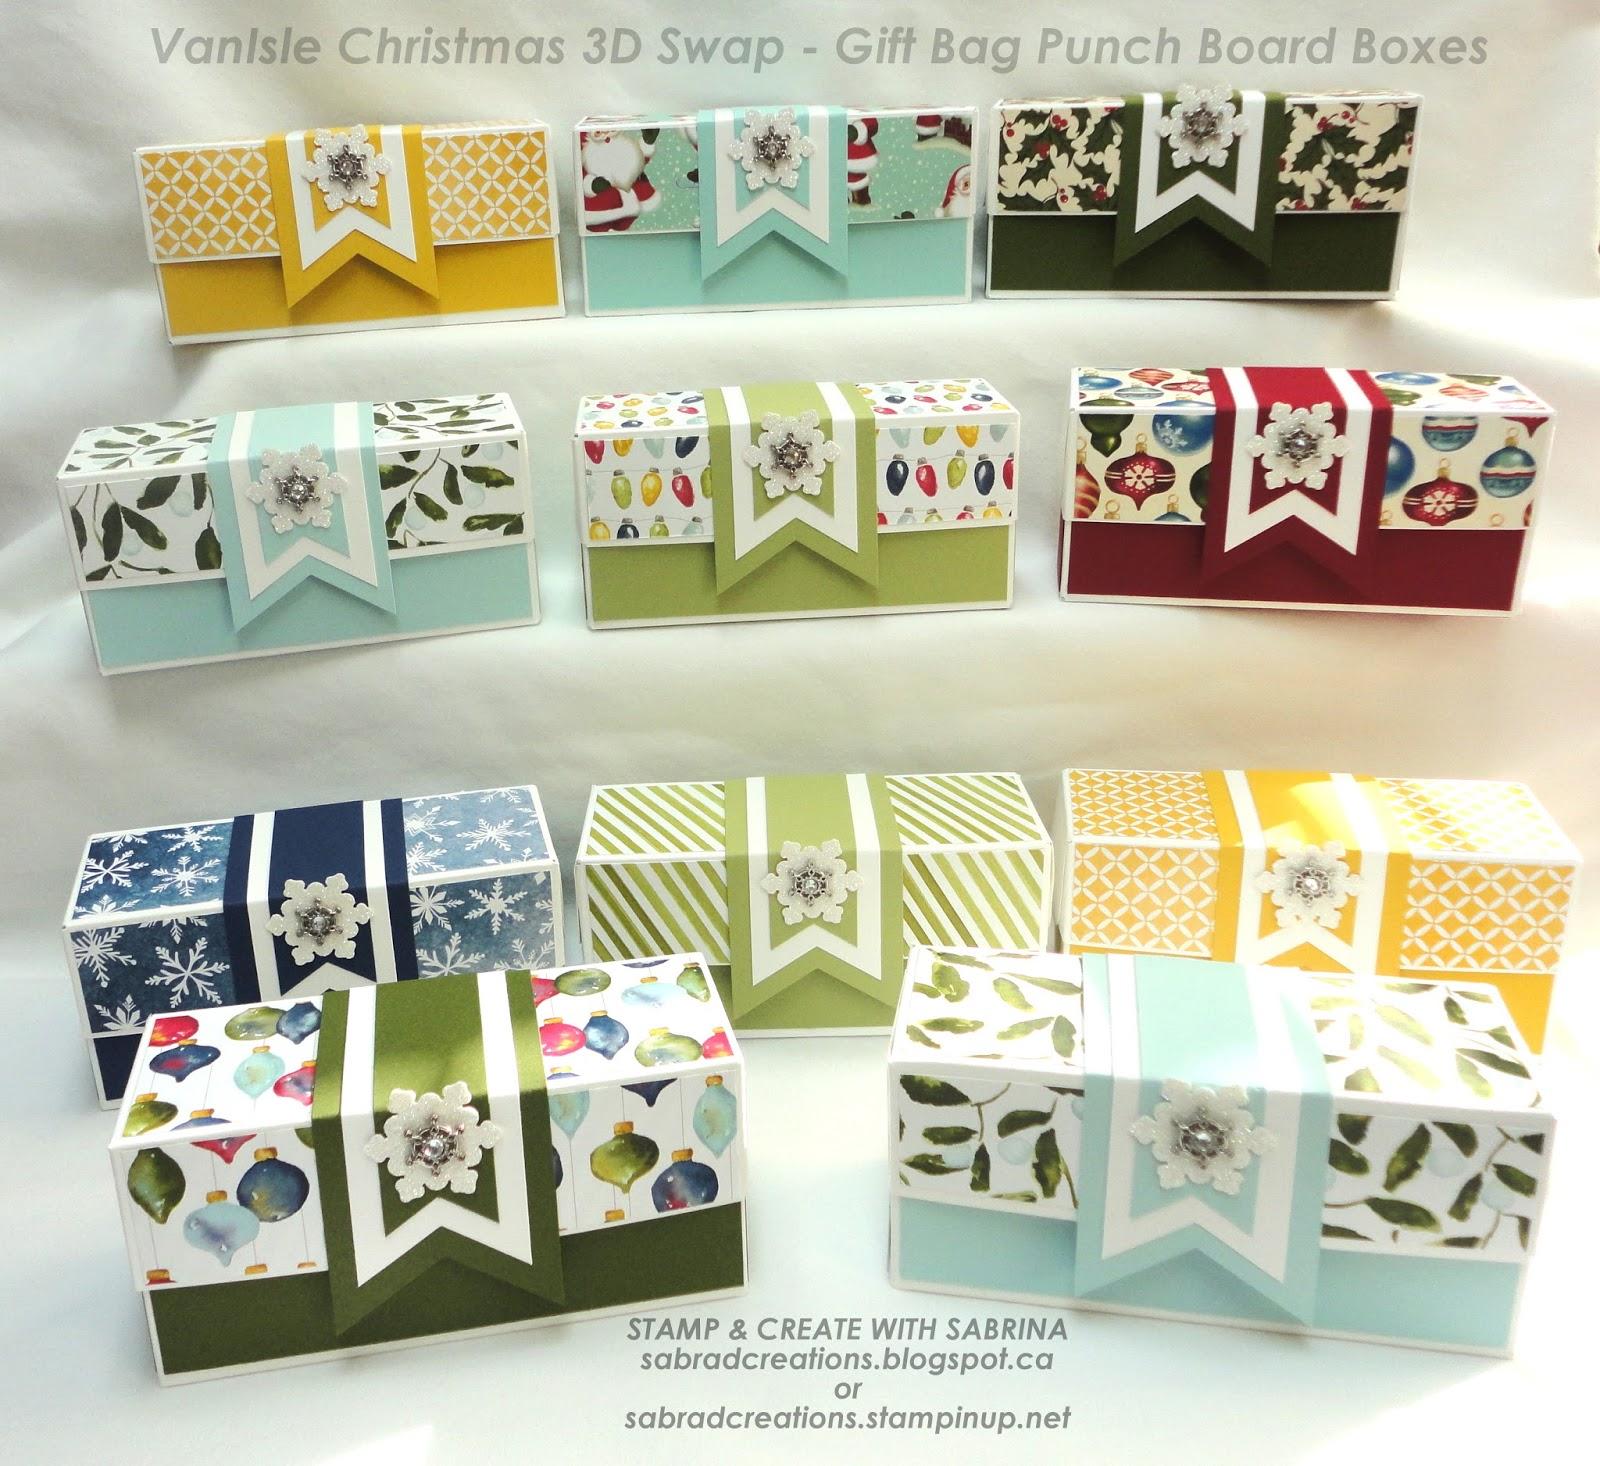 Stamp & Create With Sabrina: VanIsle Swap - Christmas Gift Boxes ...